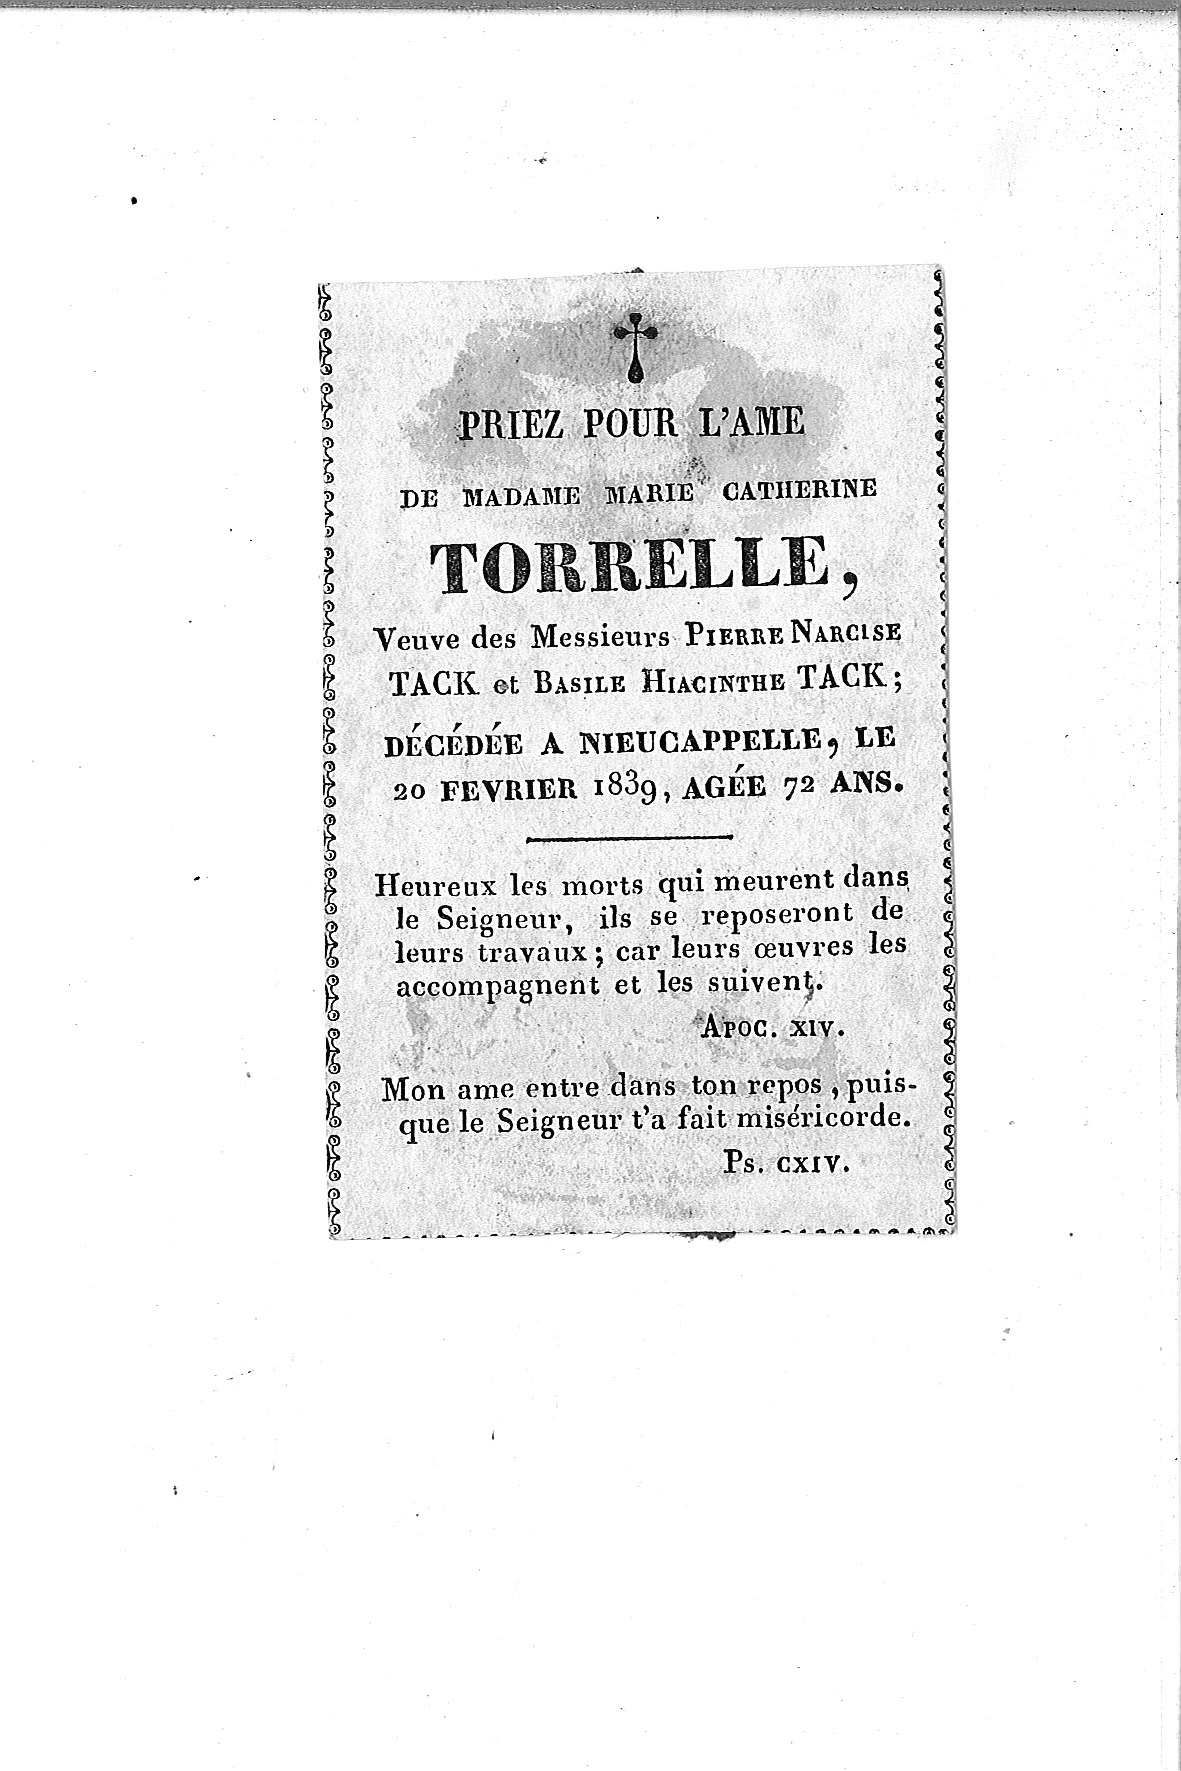 Marie-Catherine(1839)20120621134457_00107.jpg